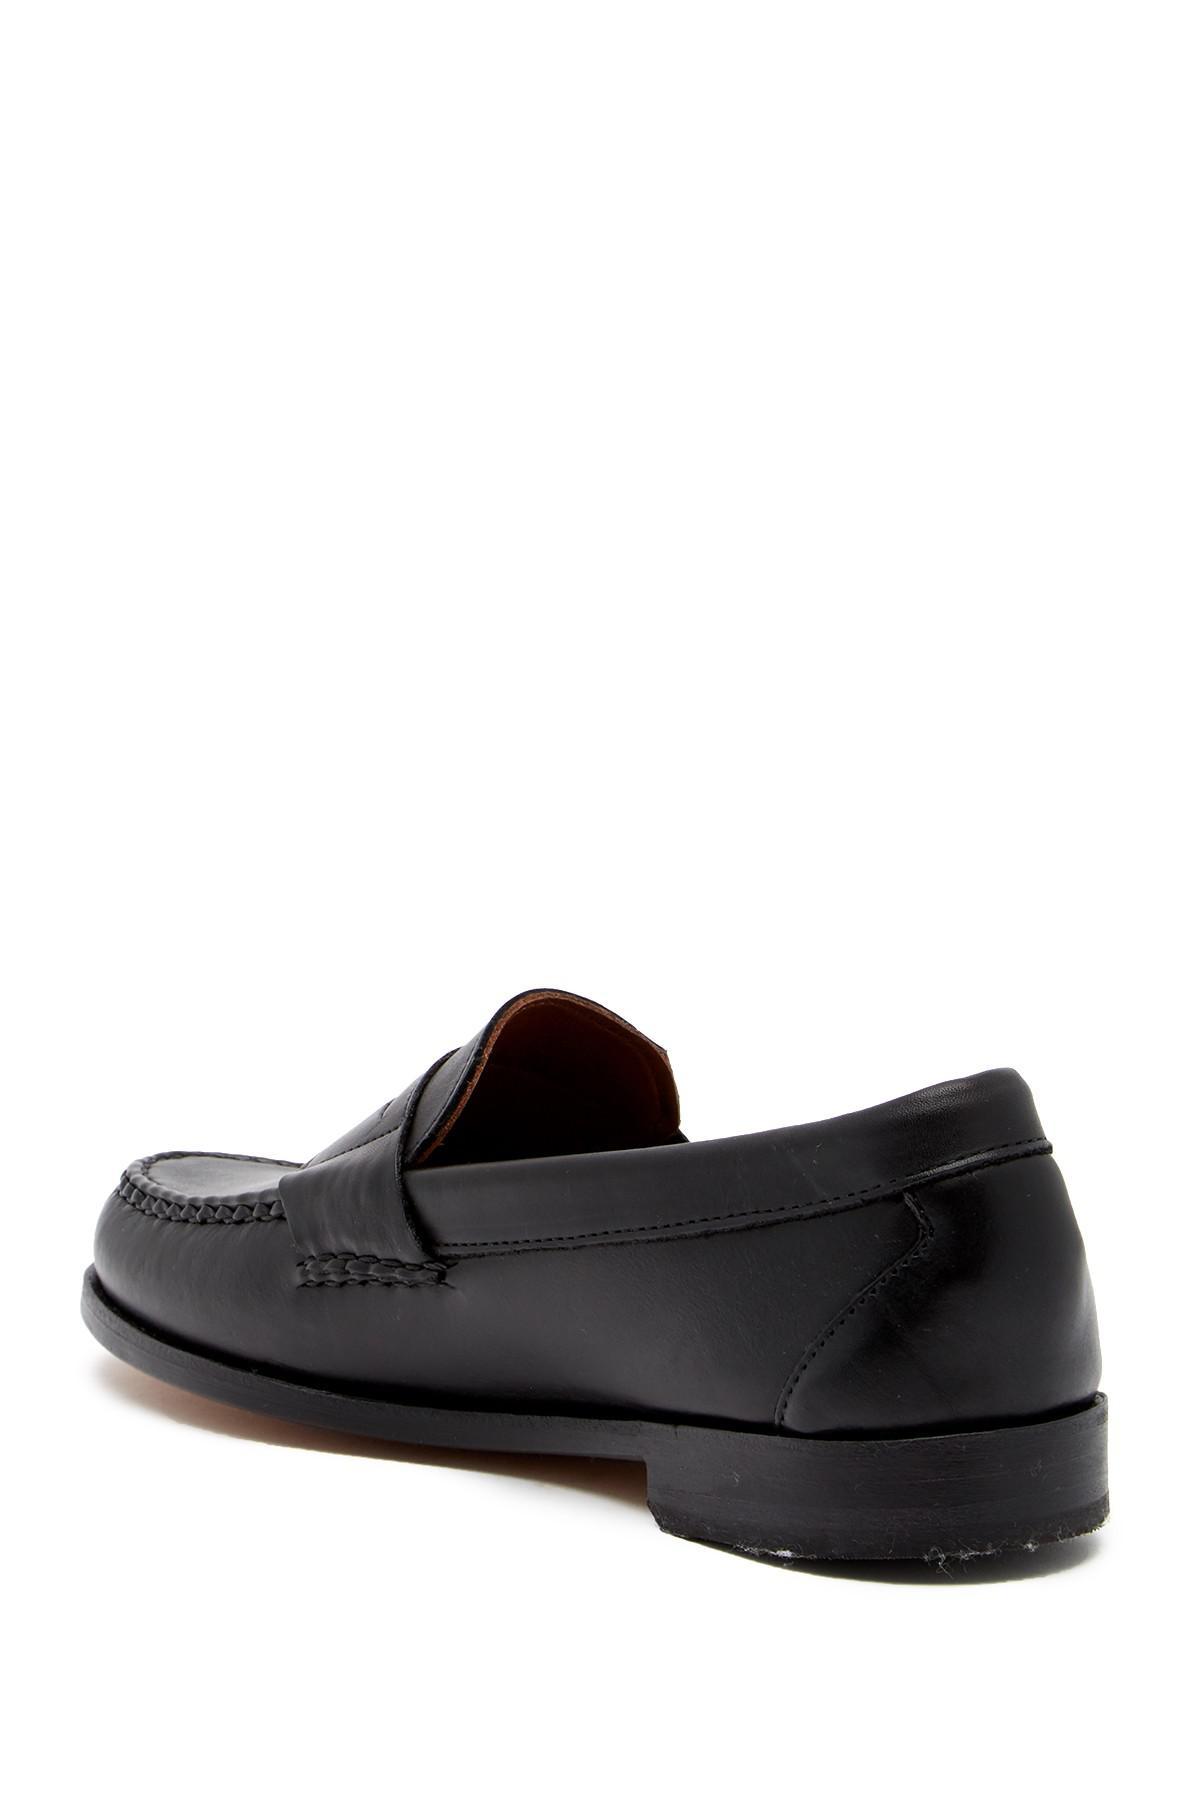 76d33cb53c6 Allen Edmonds - Black Walden Leather Loafer - Wide Width Available for Men  - Lyst. View fullscreen